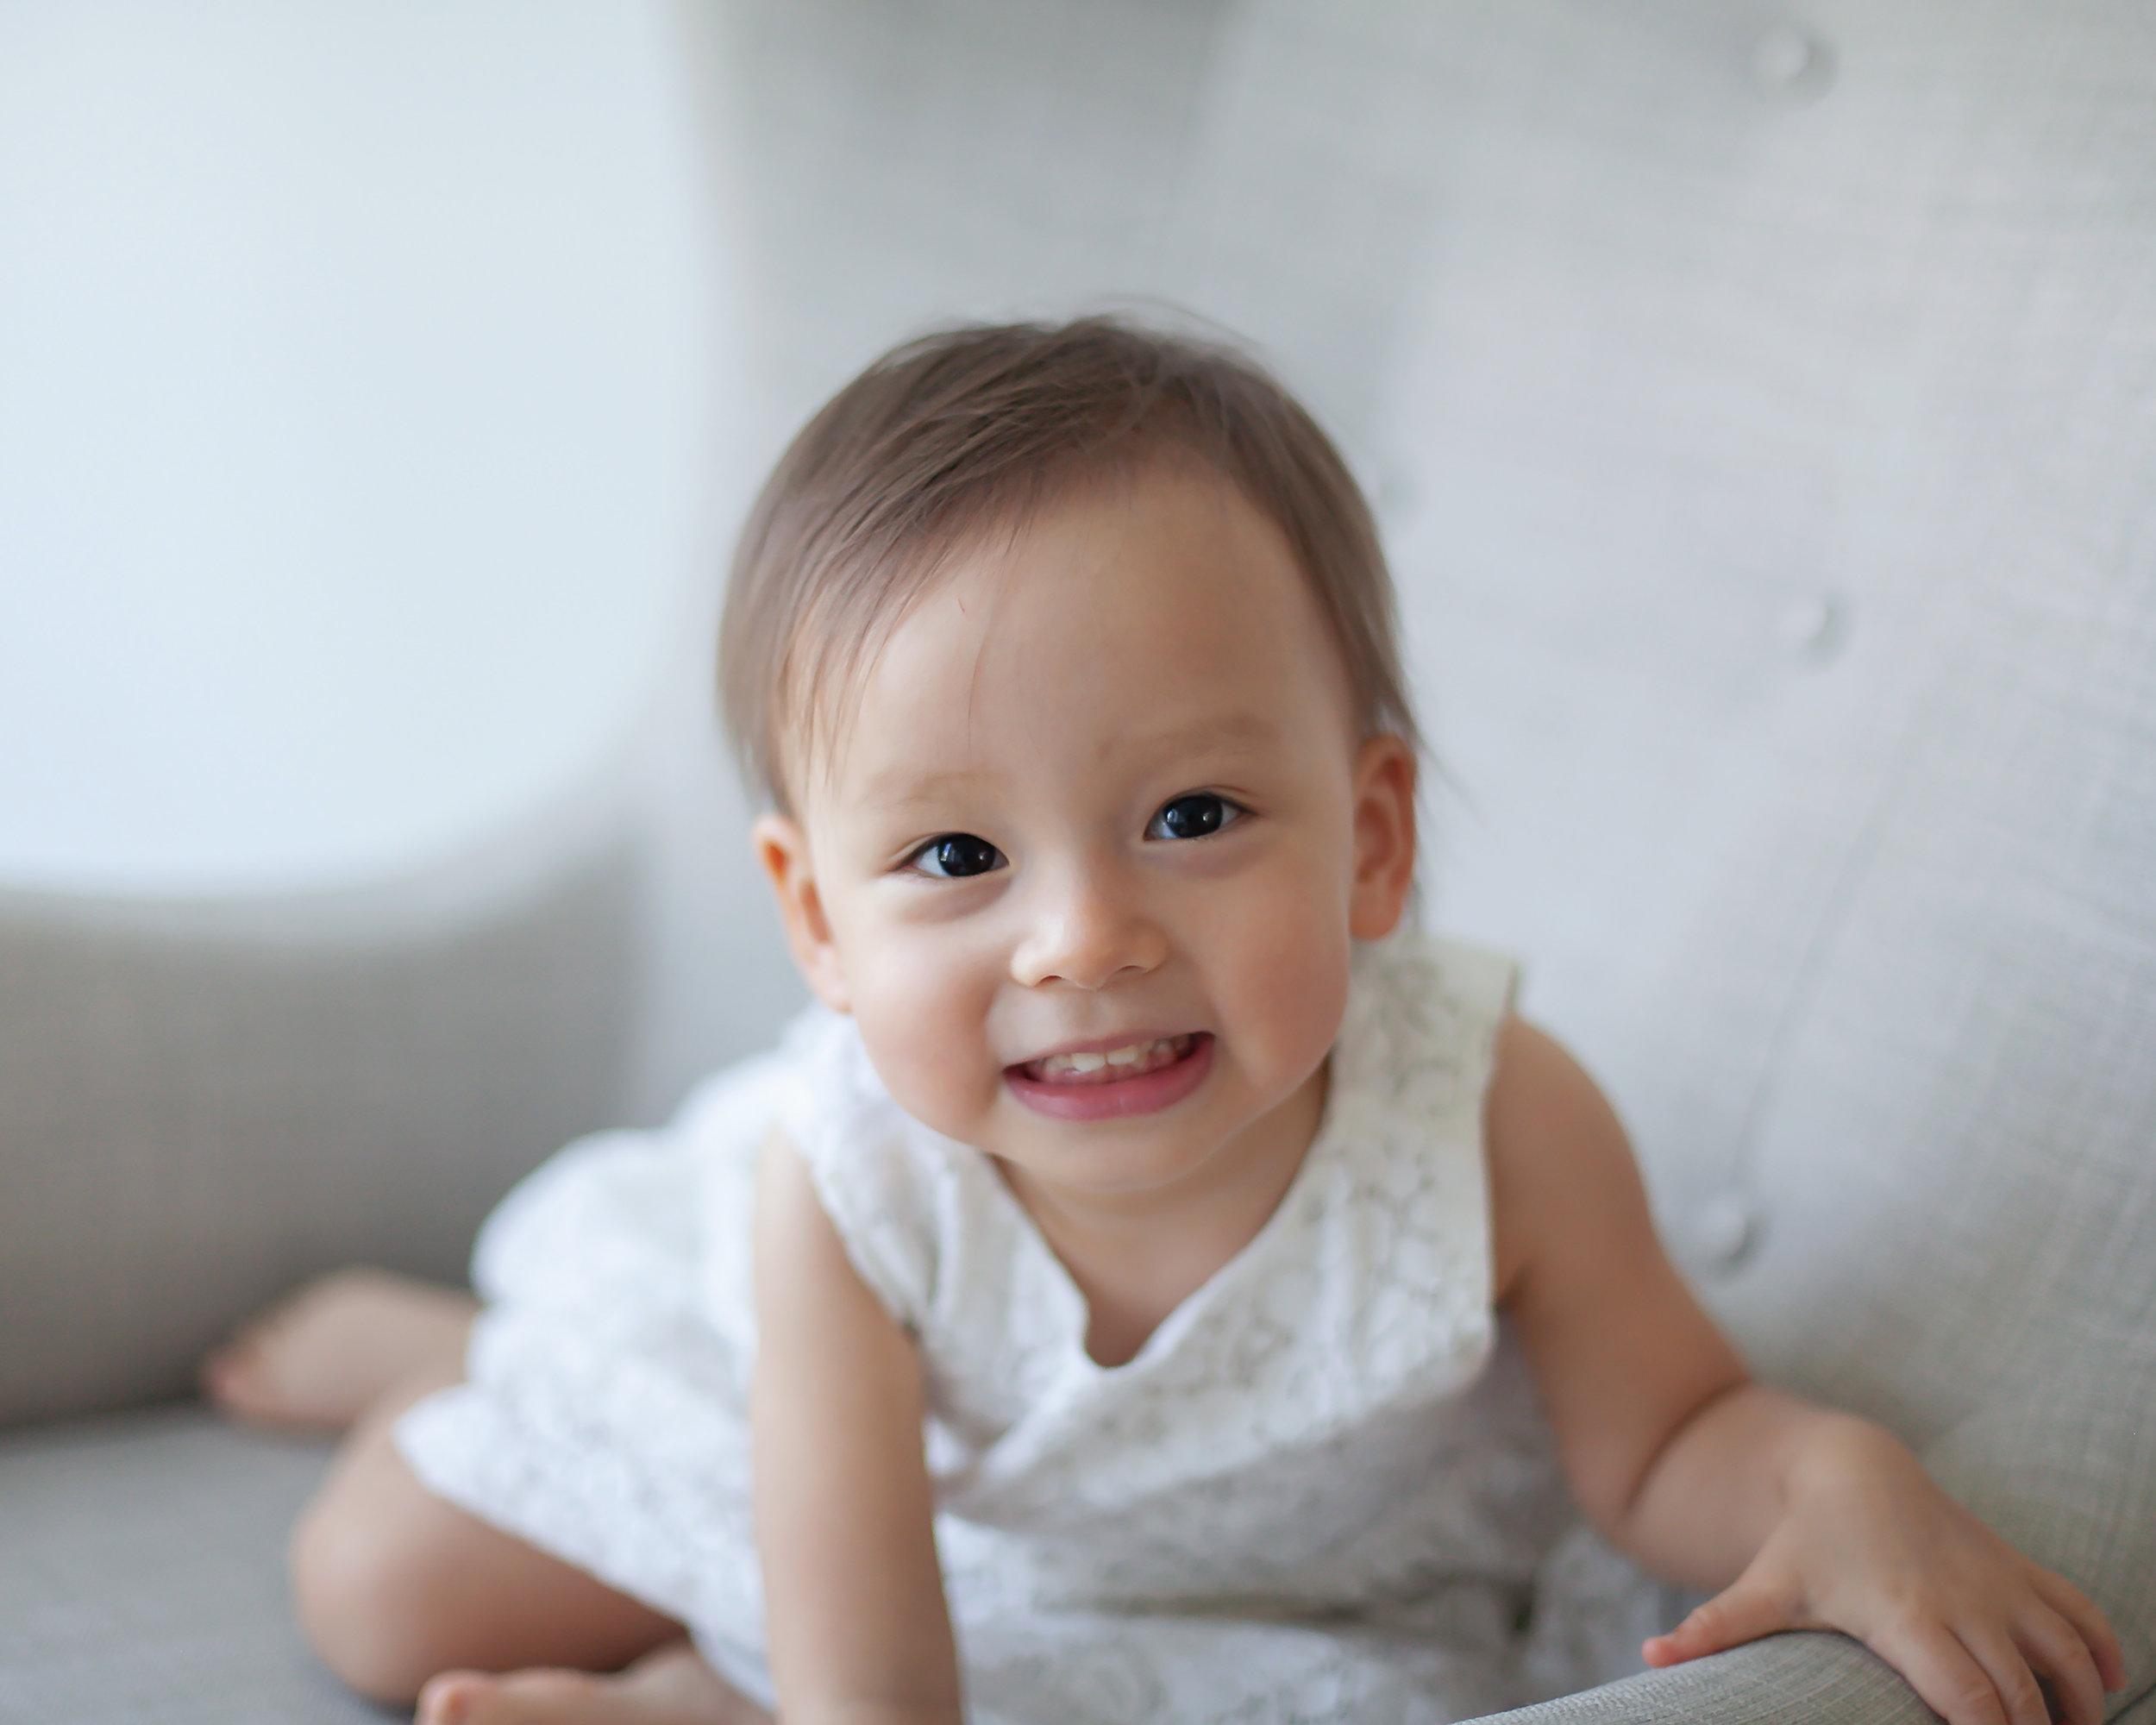 Oshawa_Toronto_Ajax_Big_Sister_Baby_Photography_Studio_Petra_King_Photorgaphy